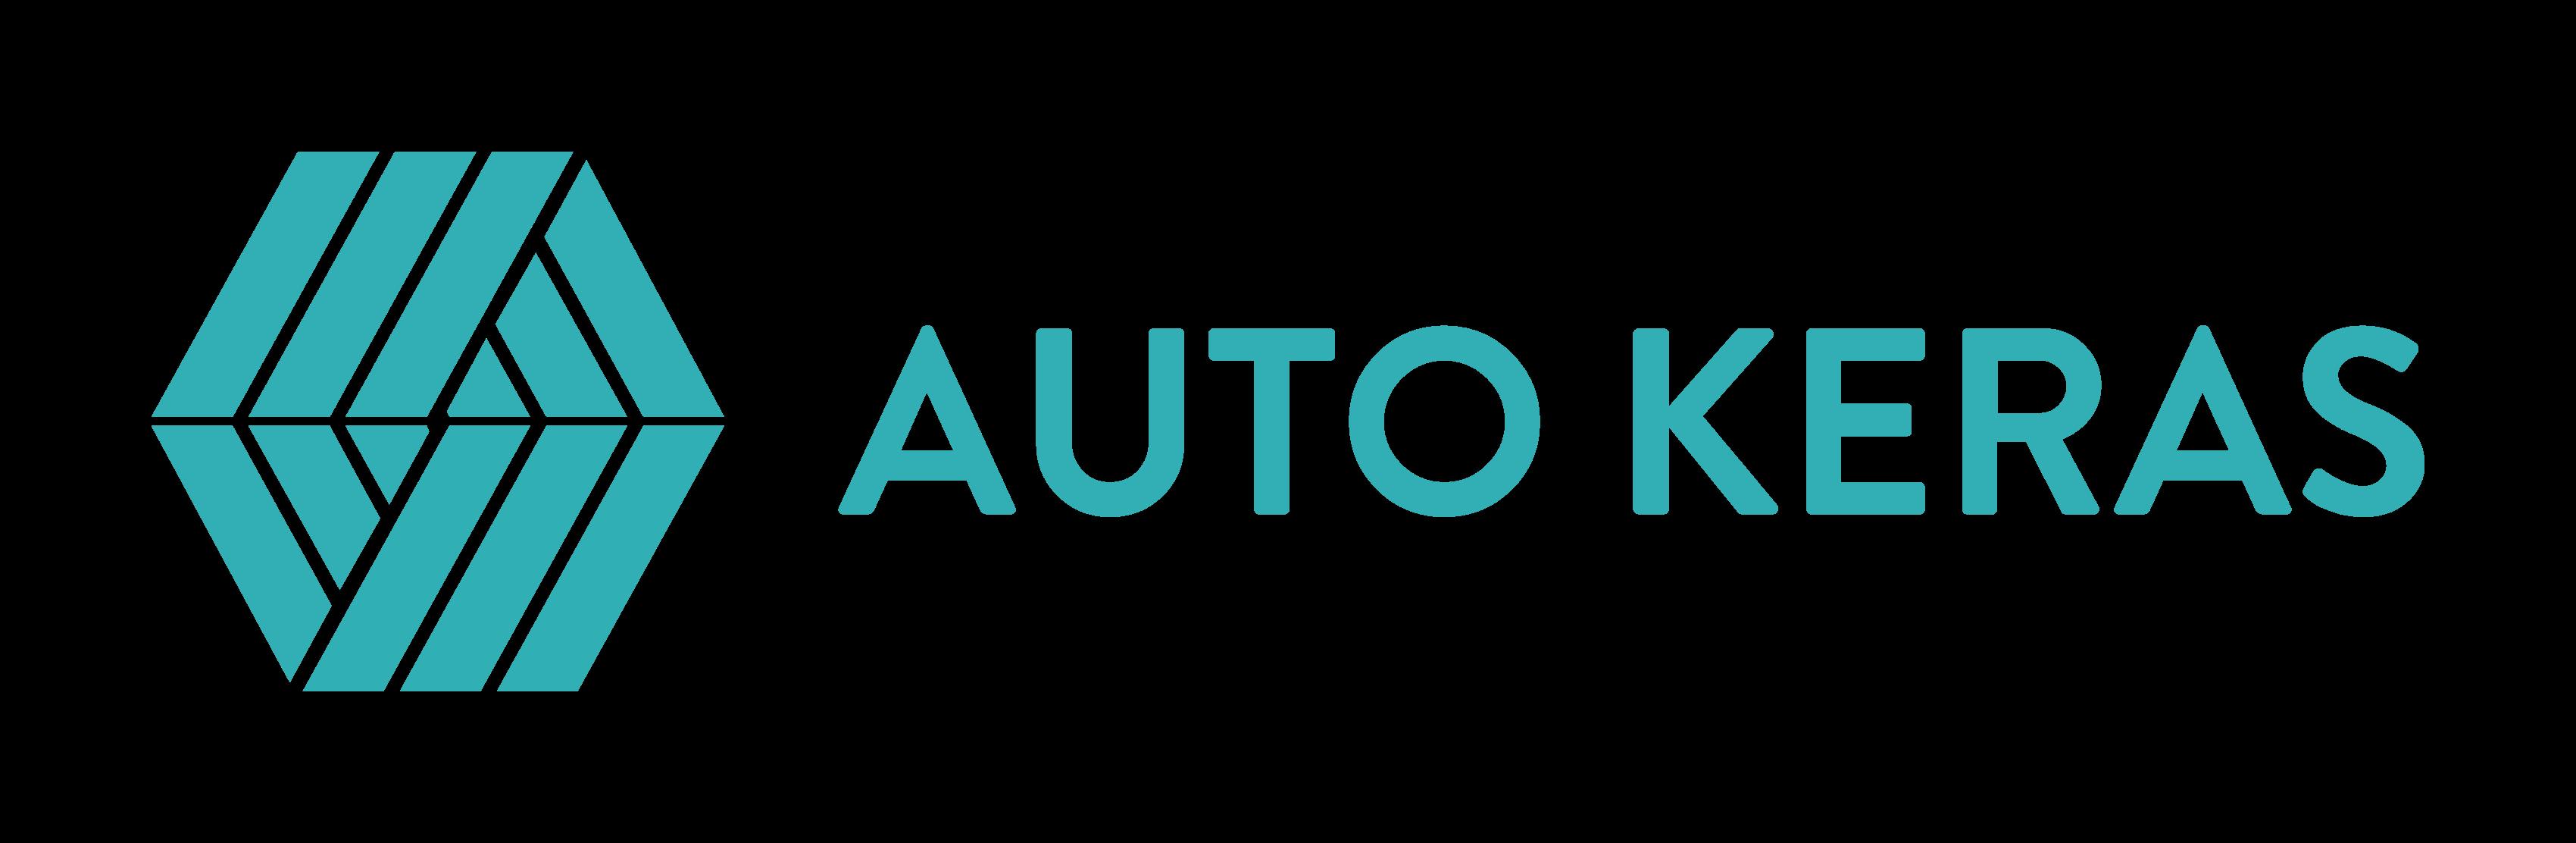 Google's AutoML Killer: Auto-Keras Opensource Automated ML